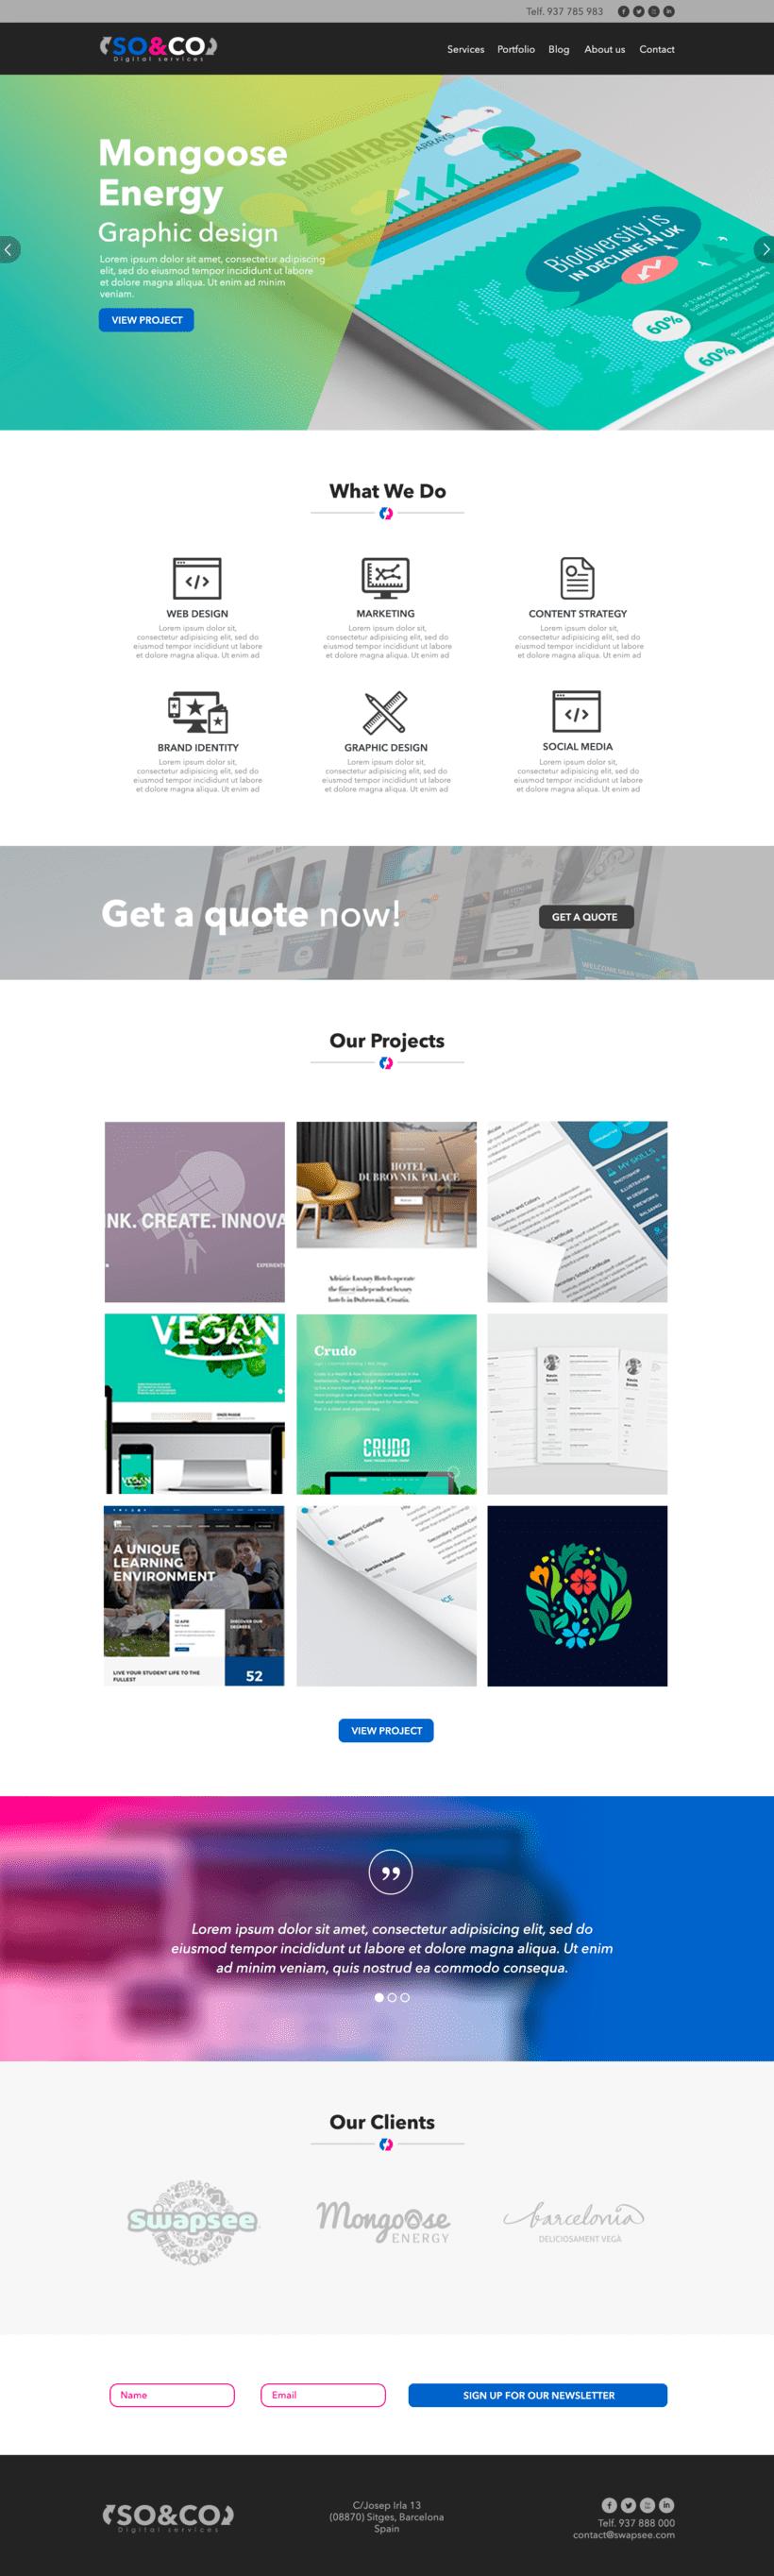 Diseño Web/UI/UX: So&Co Digital Services 0